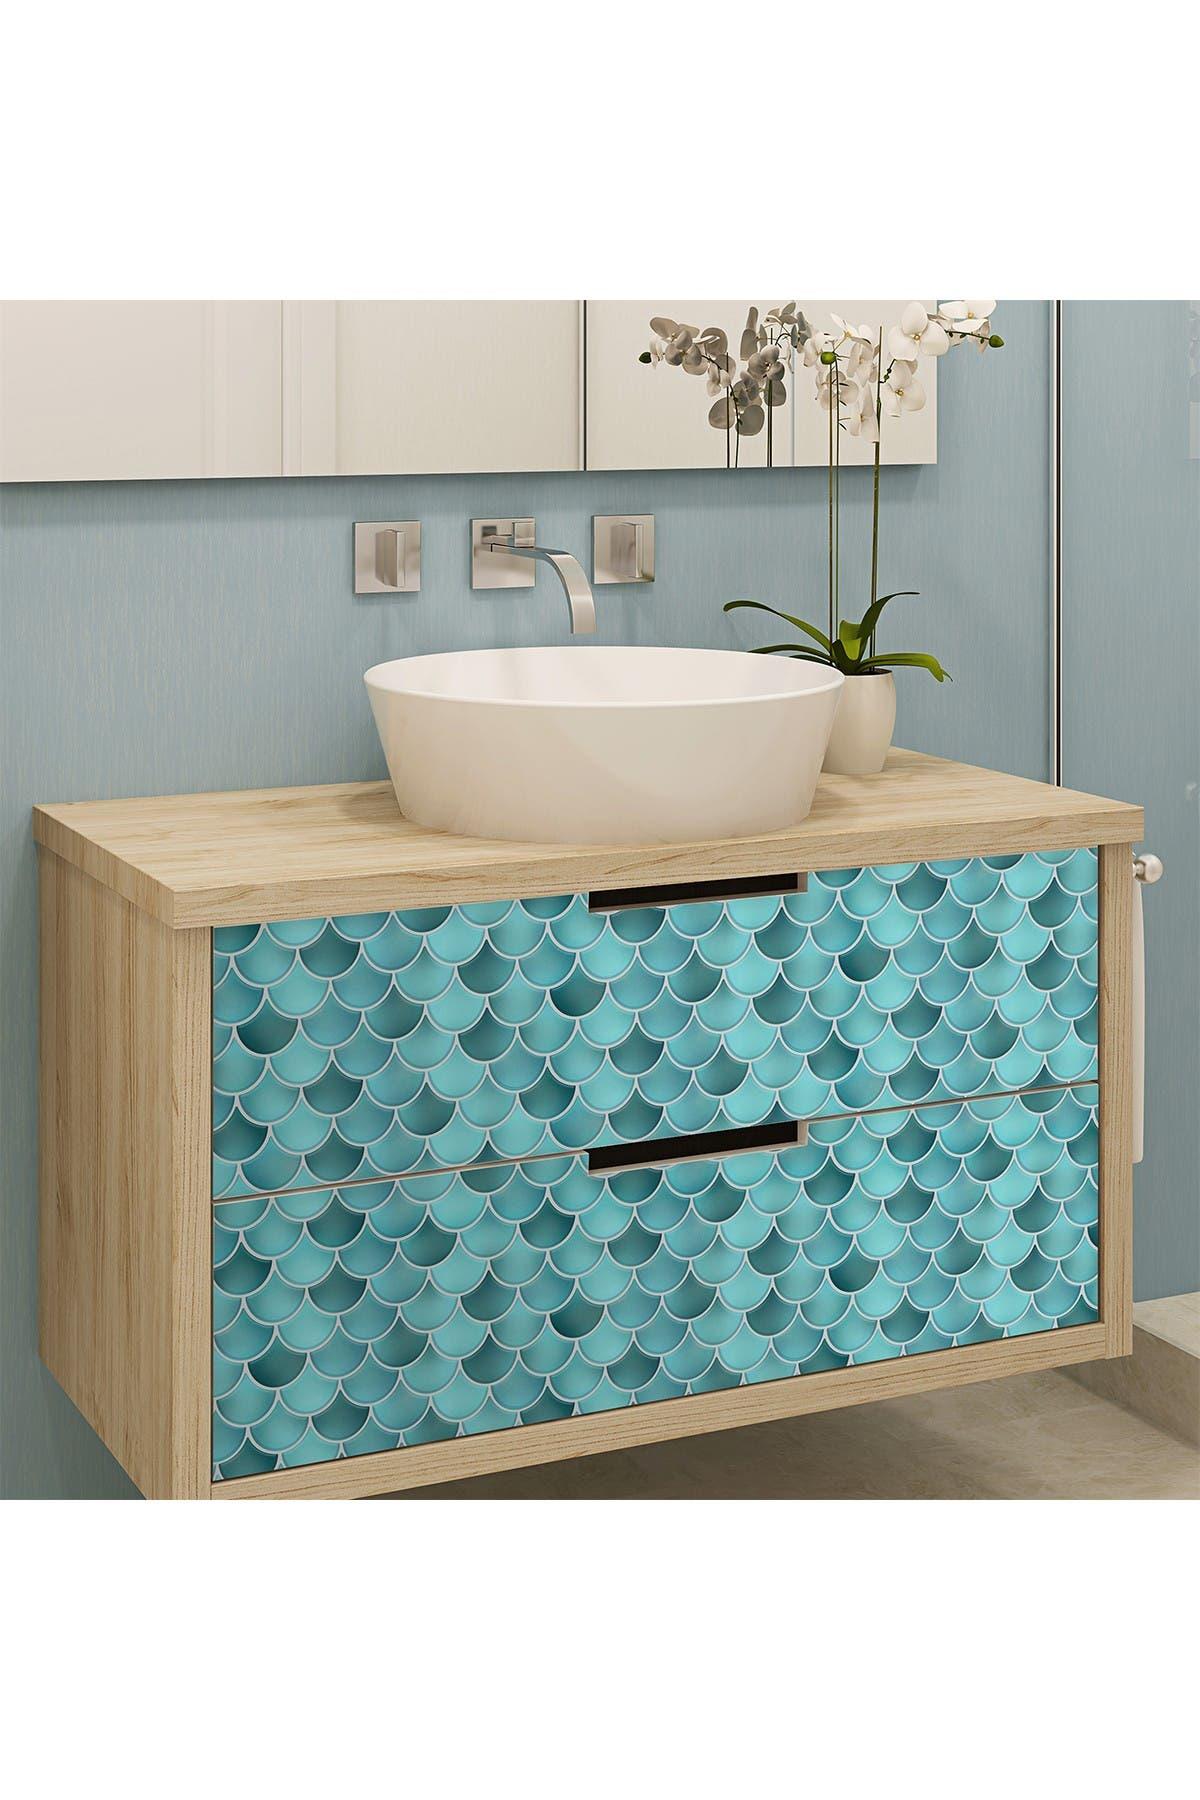 Image of WalPlus Fresh Turquoise Glossy 3D Metro Sticker Tiles Contemporary Eclectic Wall Splashbacks Mosaics